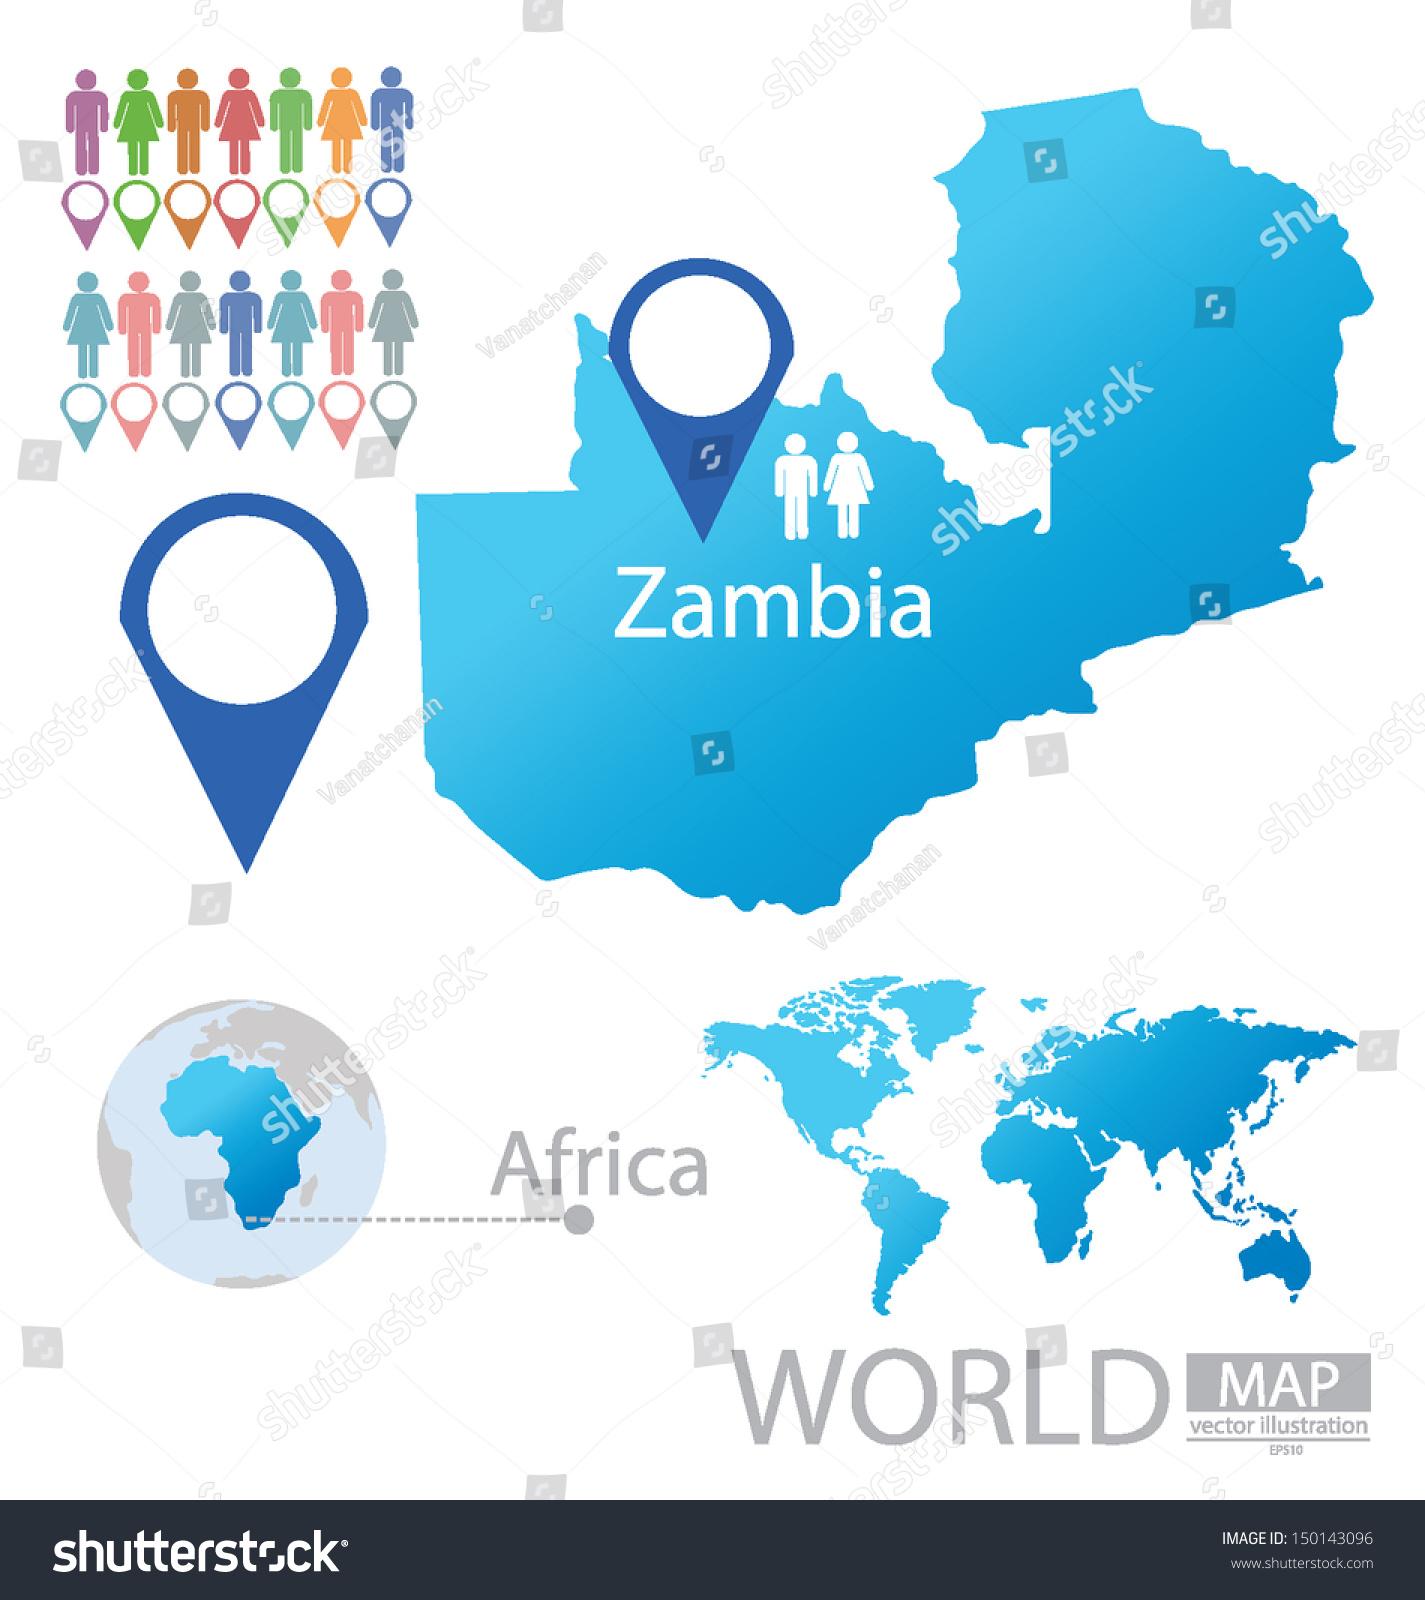 Republic zambia world map vector illustration stock photo photo republic of zambia world map vector illustration gumiabroncs Gallery